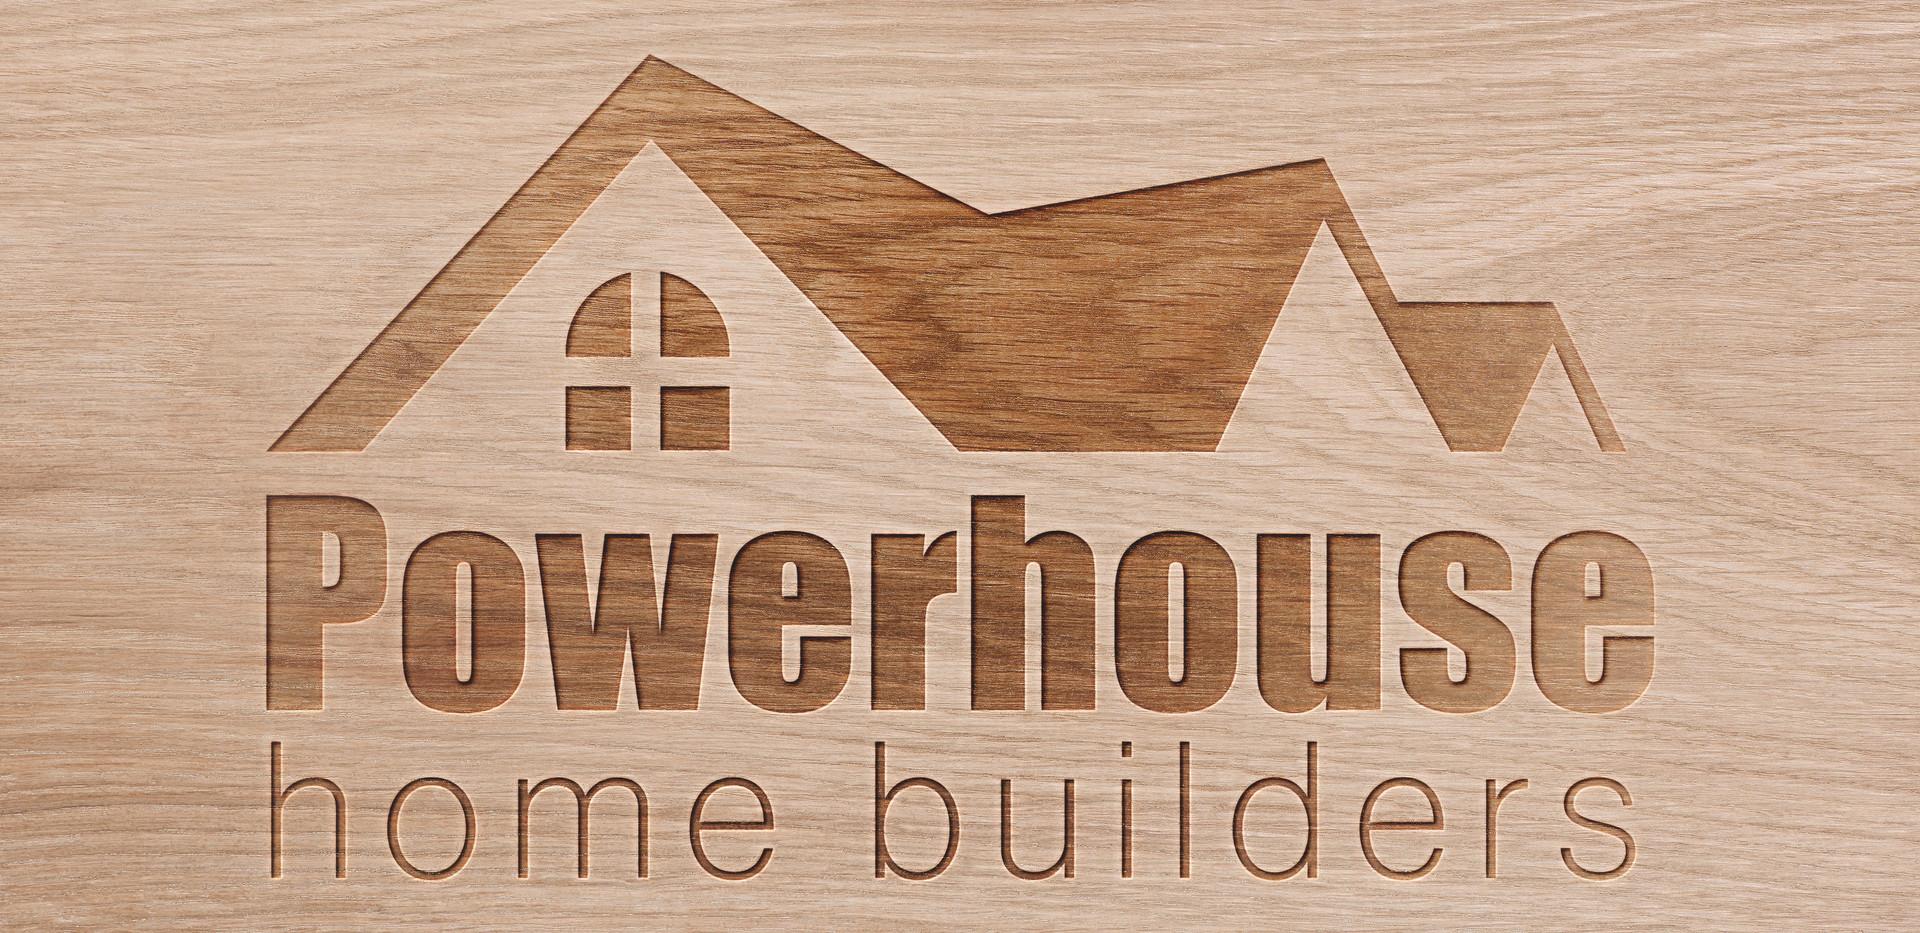 Powerhouse Home Builders Mock Up